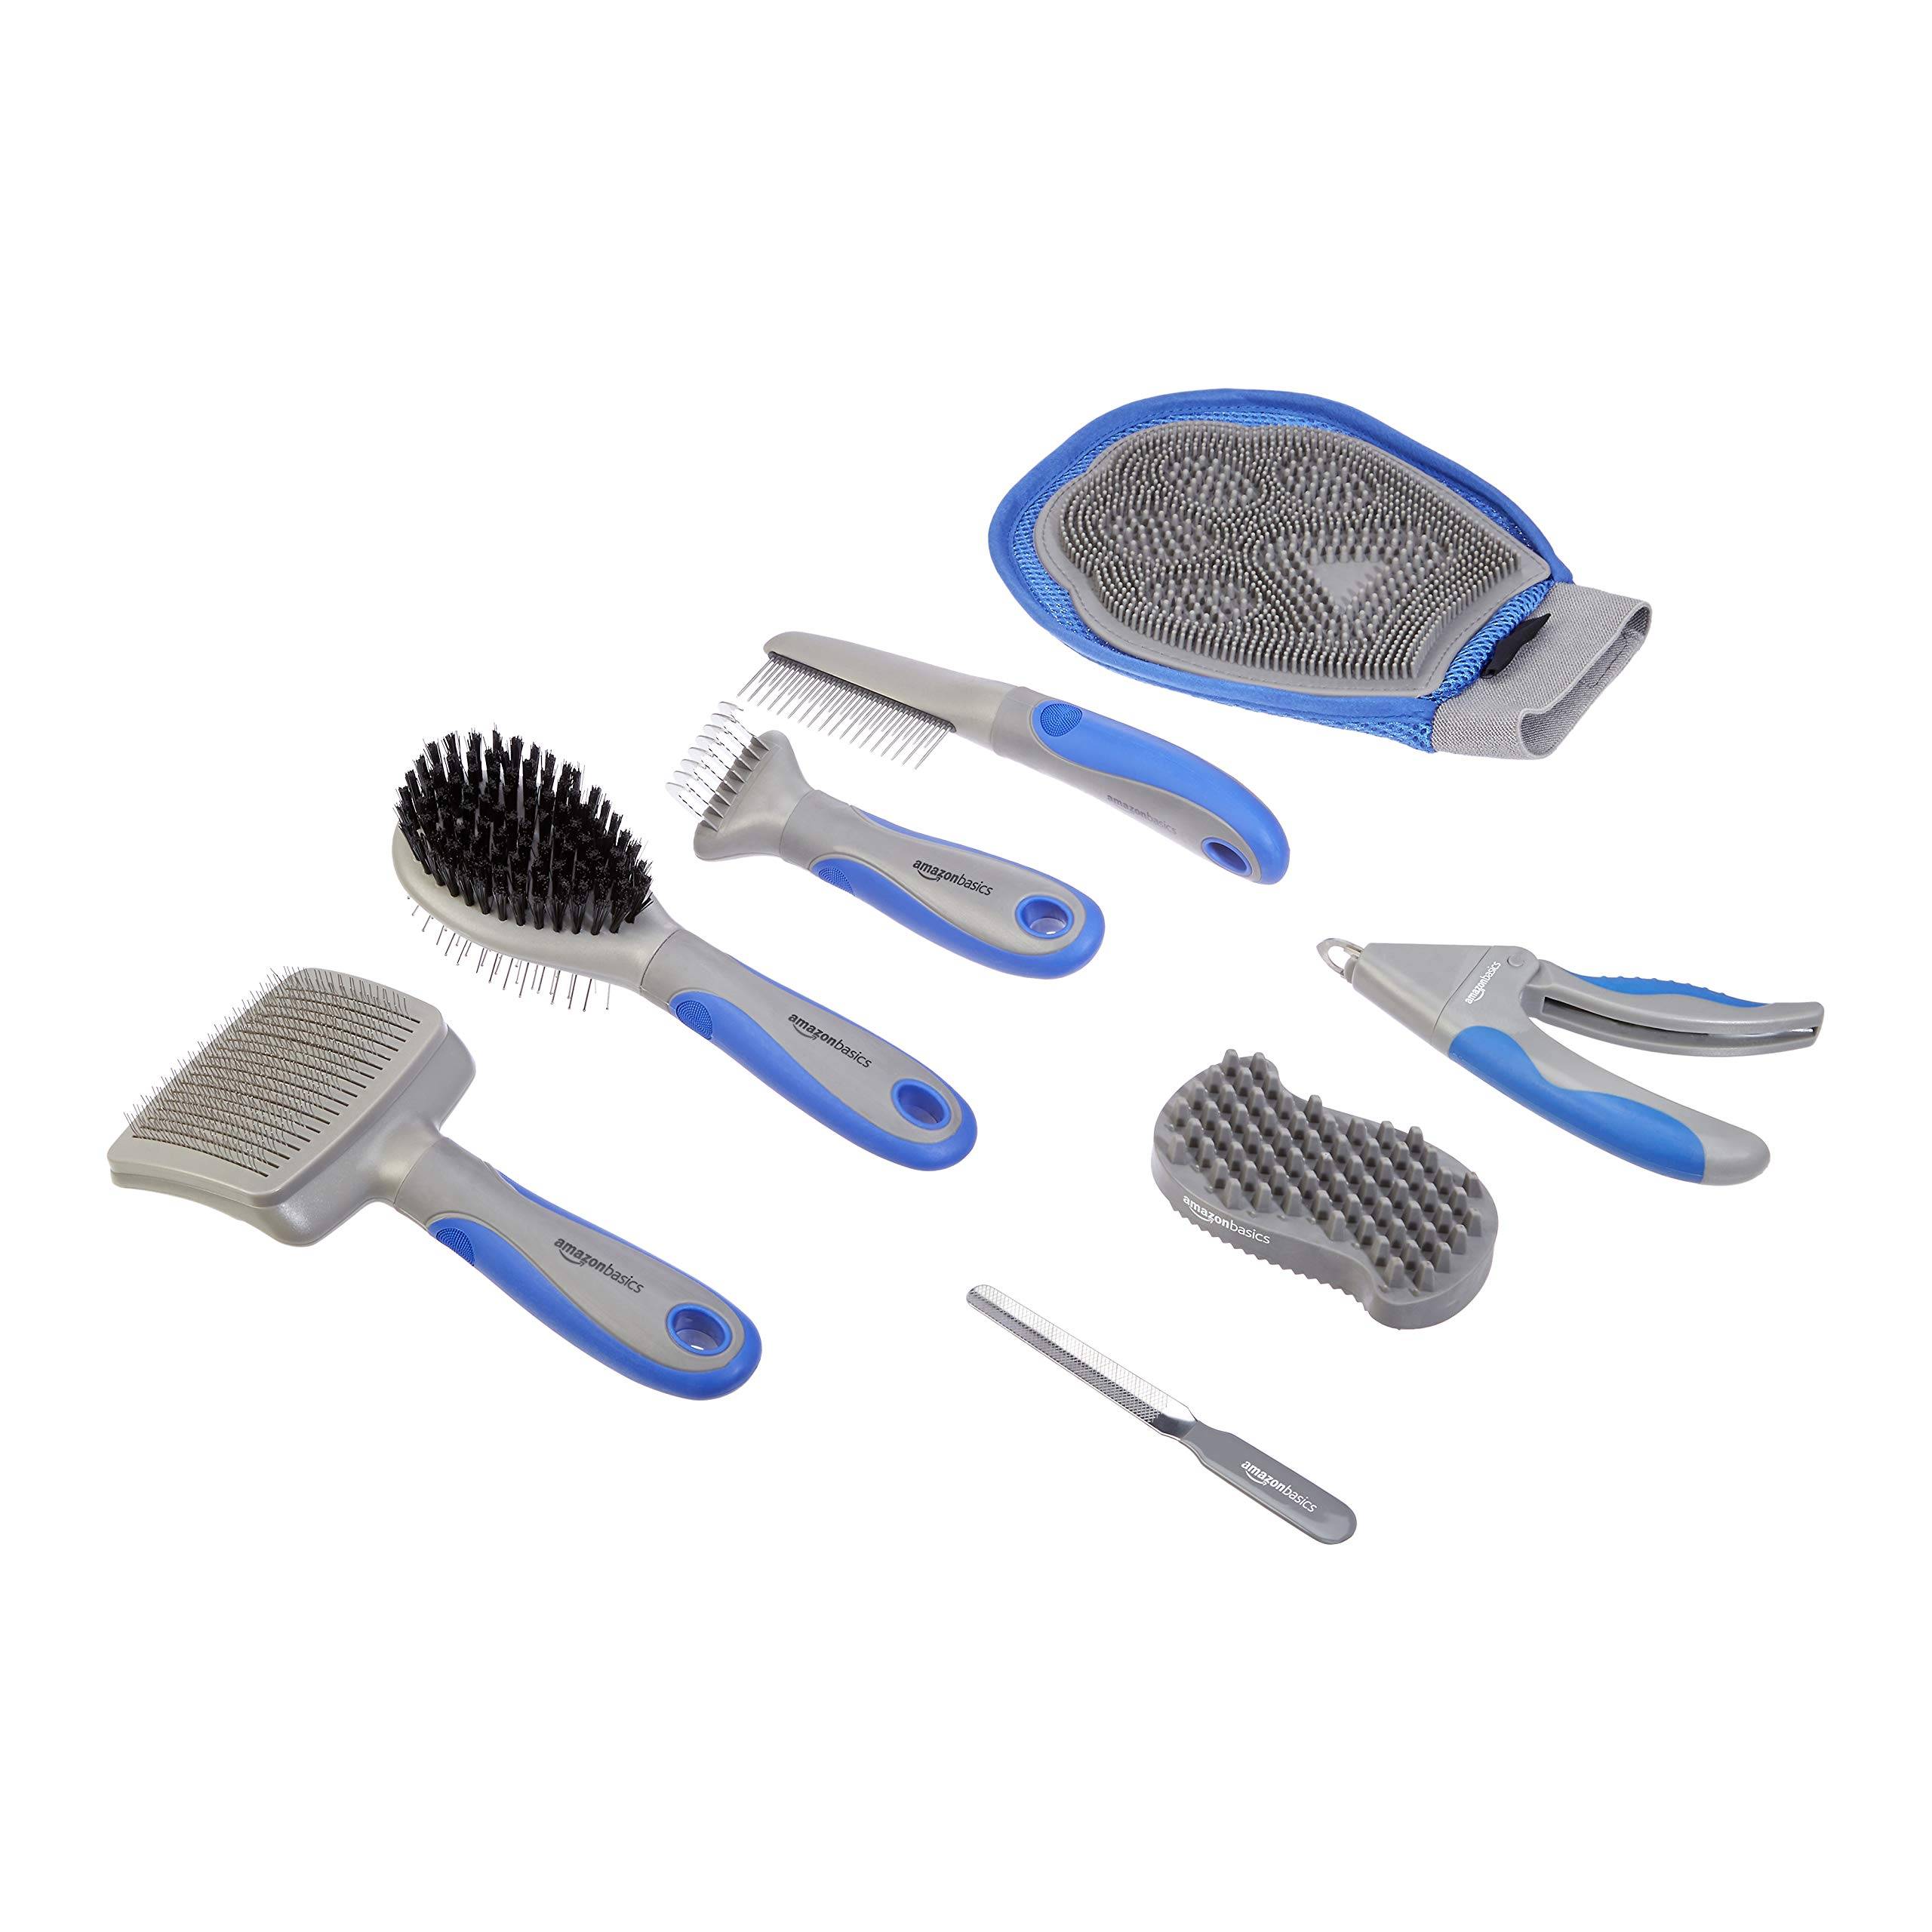 Amazon Basics 8-Piece Pet Brush & Grooming Set